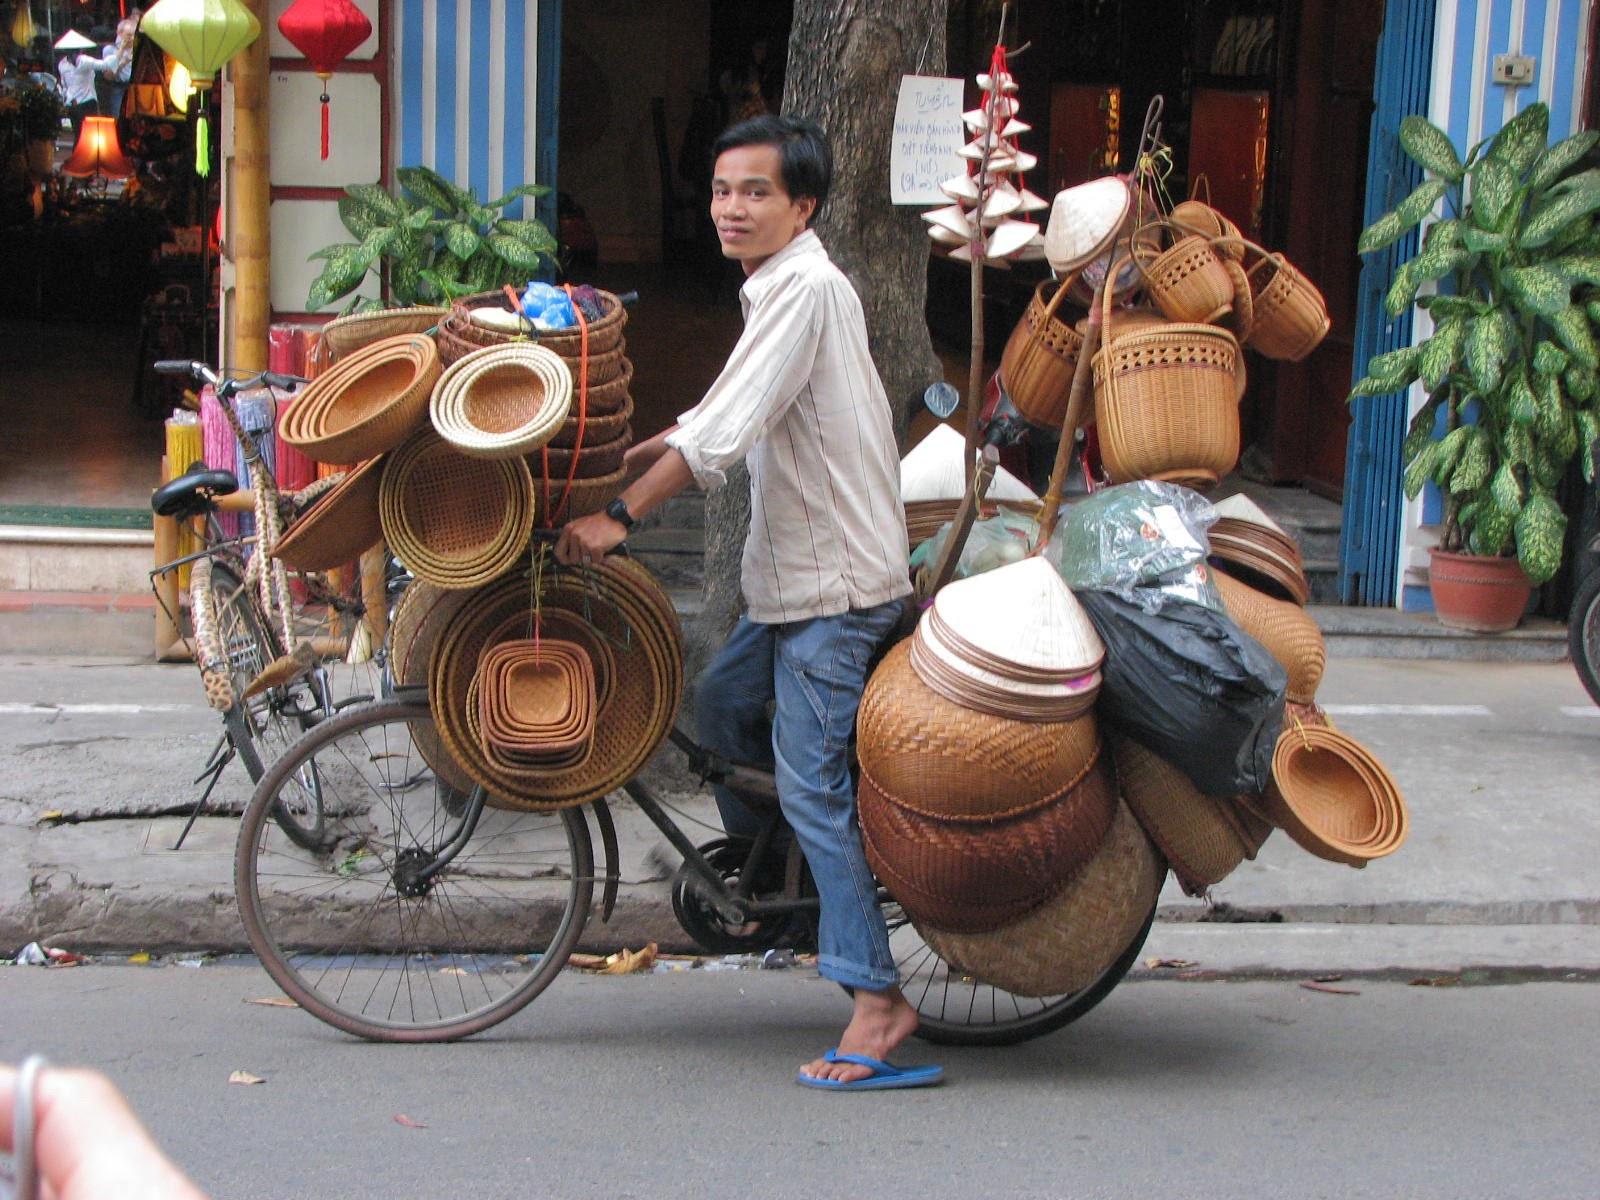 laos-mountain-biking-man-riding-bike-with-lots-of-woven-baskets-tiger-trail-039.jpg